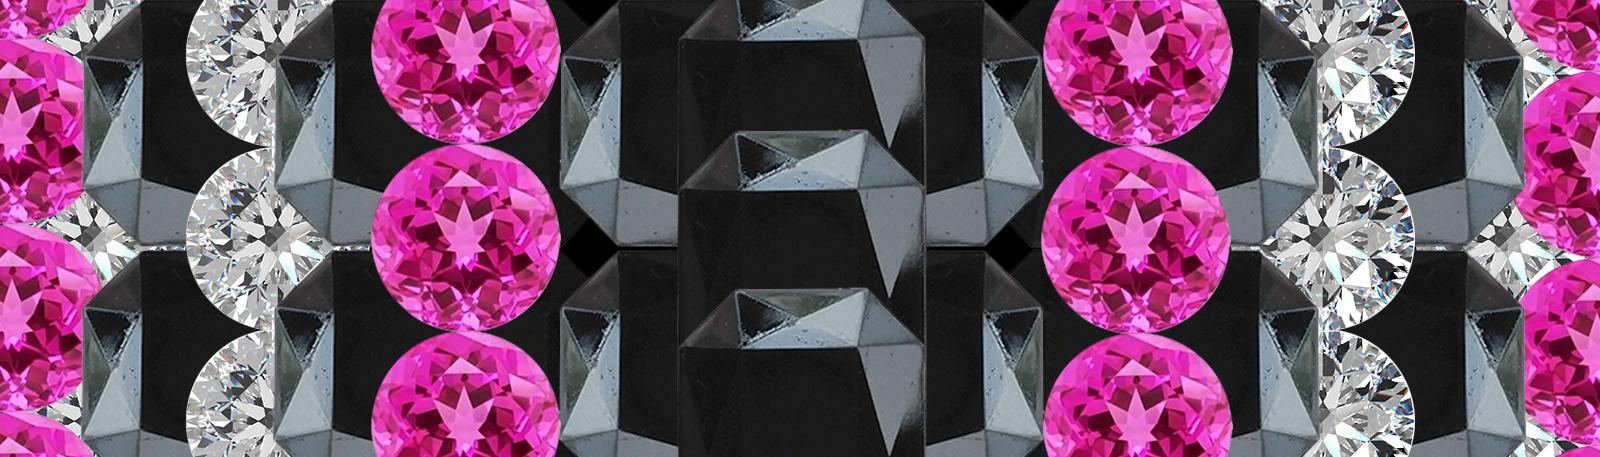 gem-banner-v10